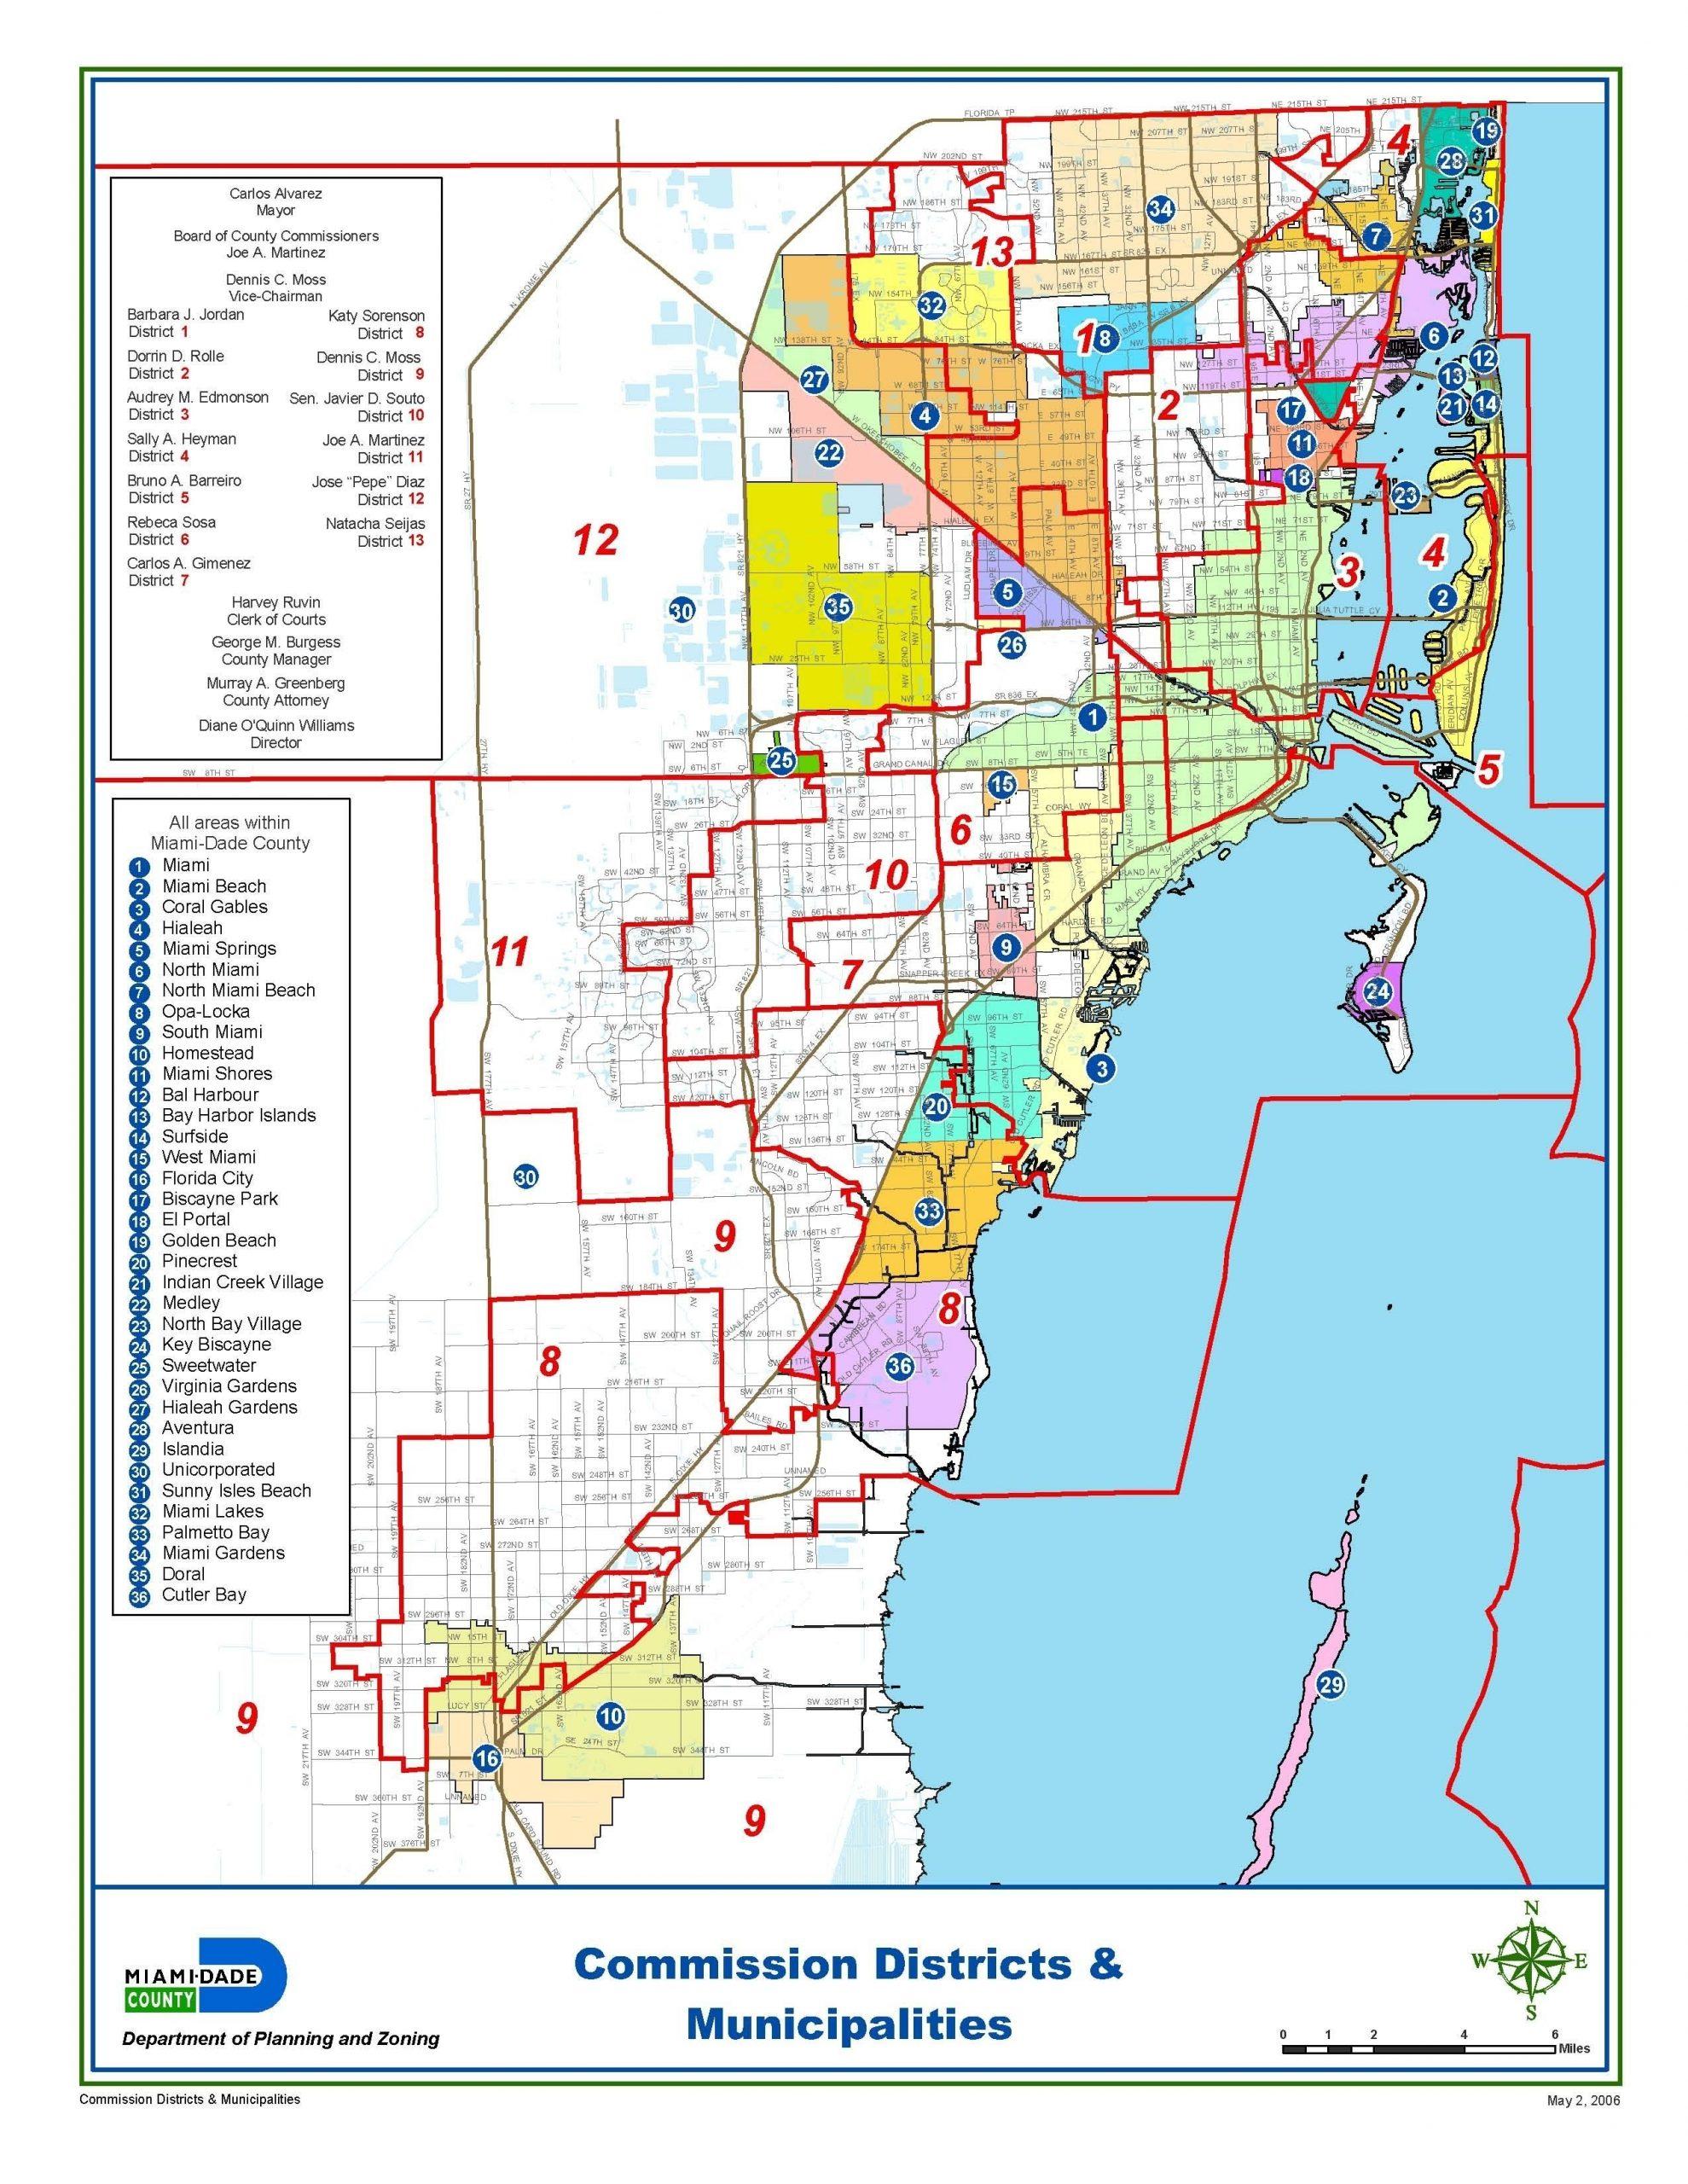 Miami-Dade Municipalities Map | Map, Broward County, Miami pertaining to Miami Dade Municipalities Map